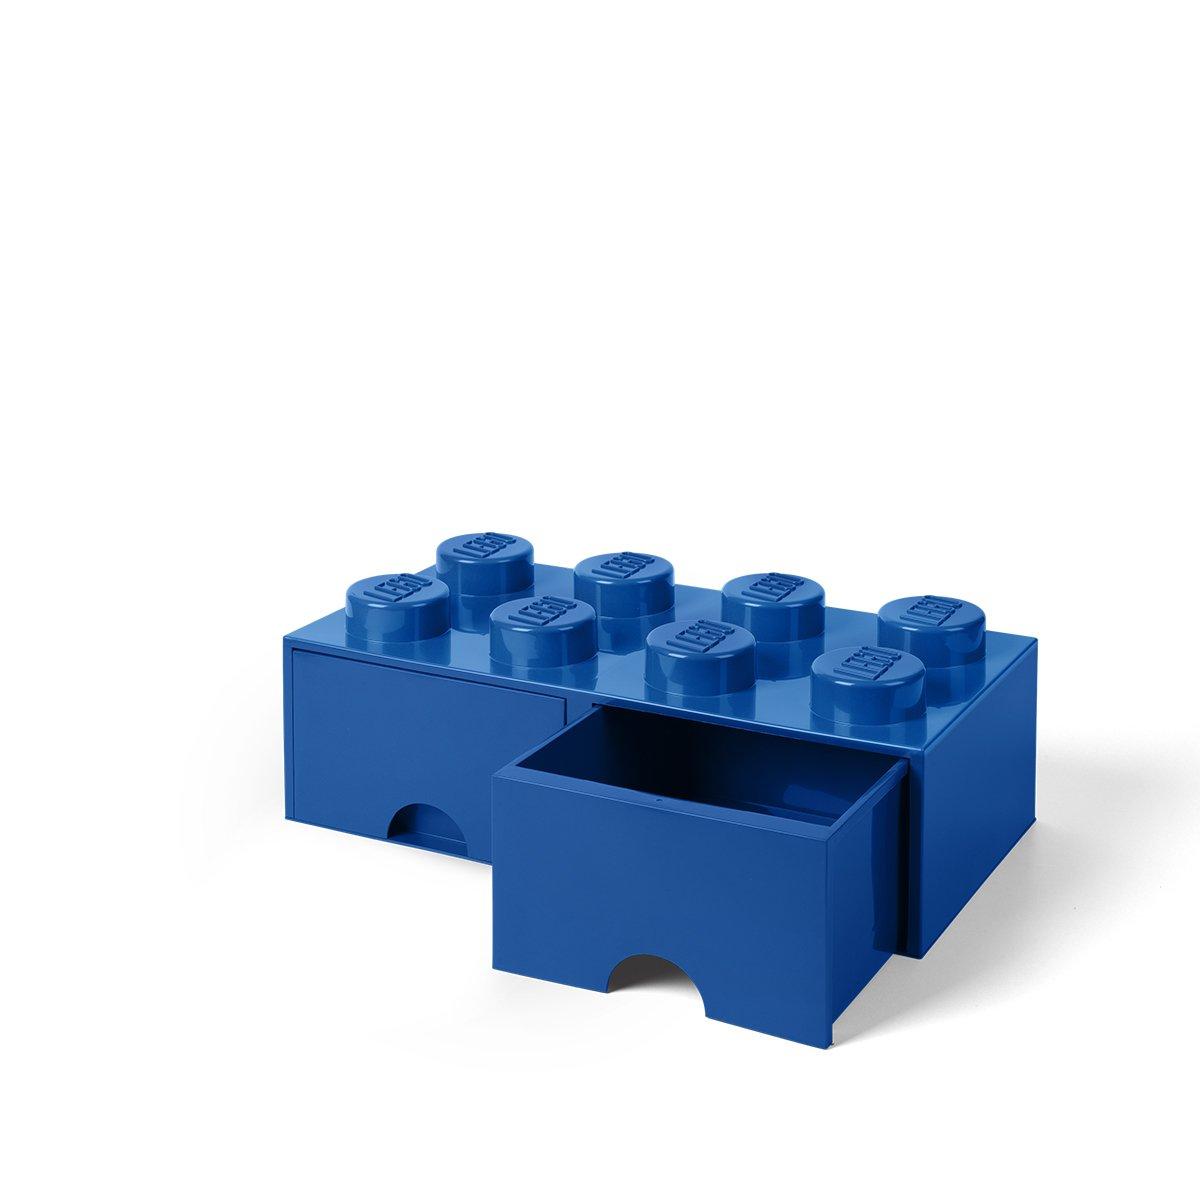 LEGO Schublade 8 Noppen, 2 Schubladen, stapelbare Box, 9,4 l 5711938029517